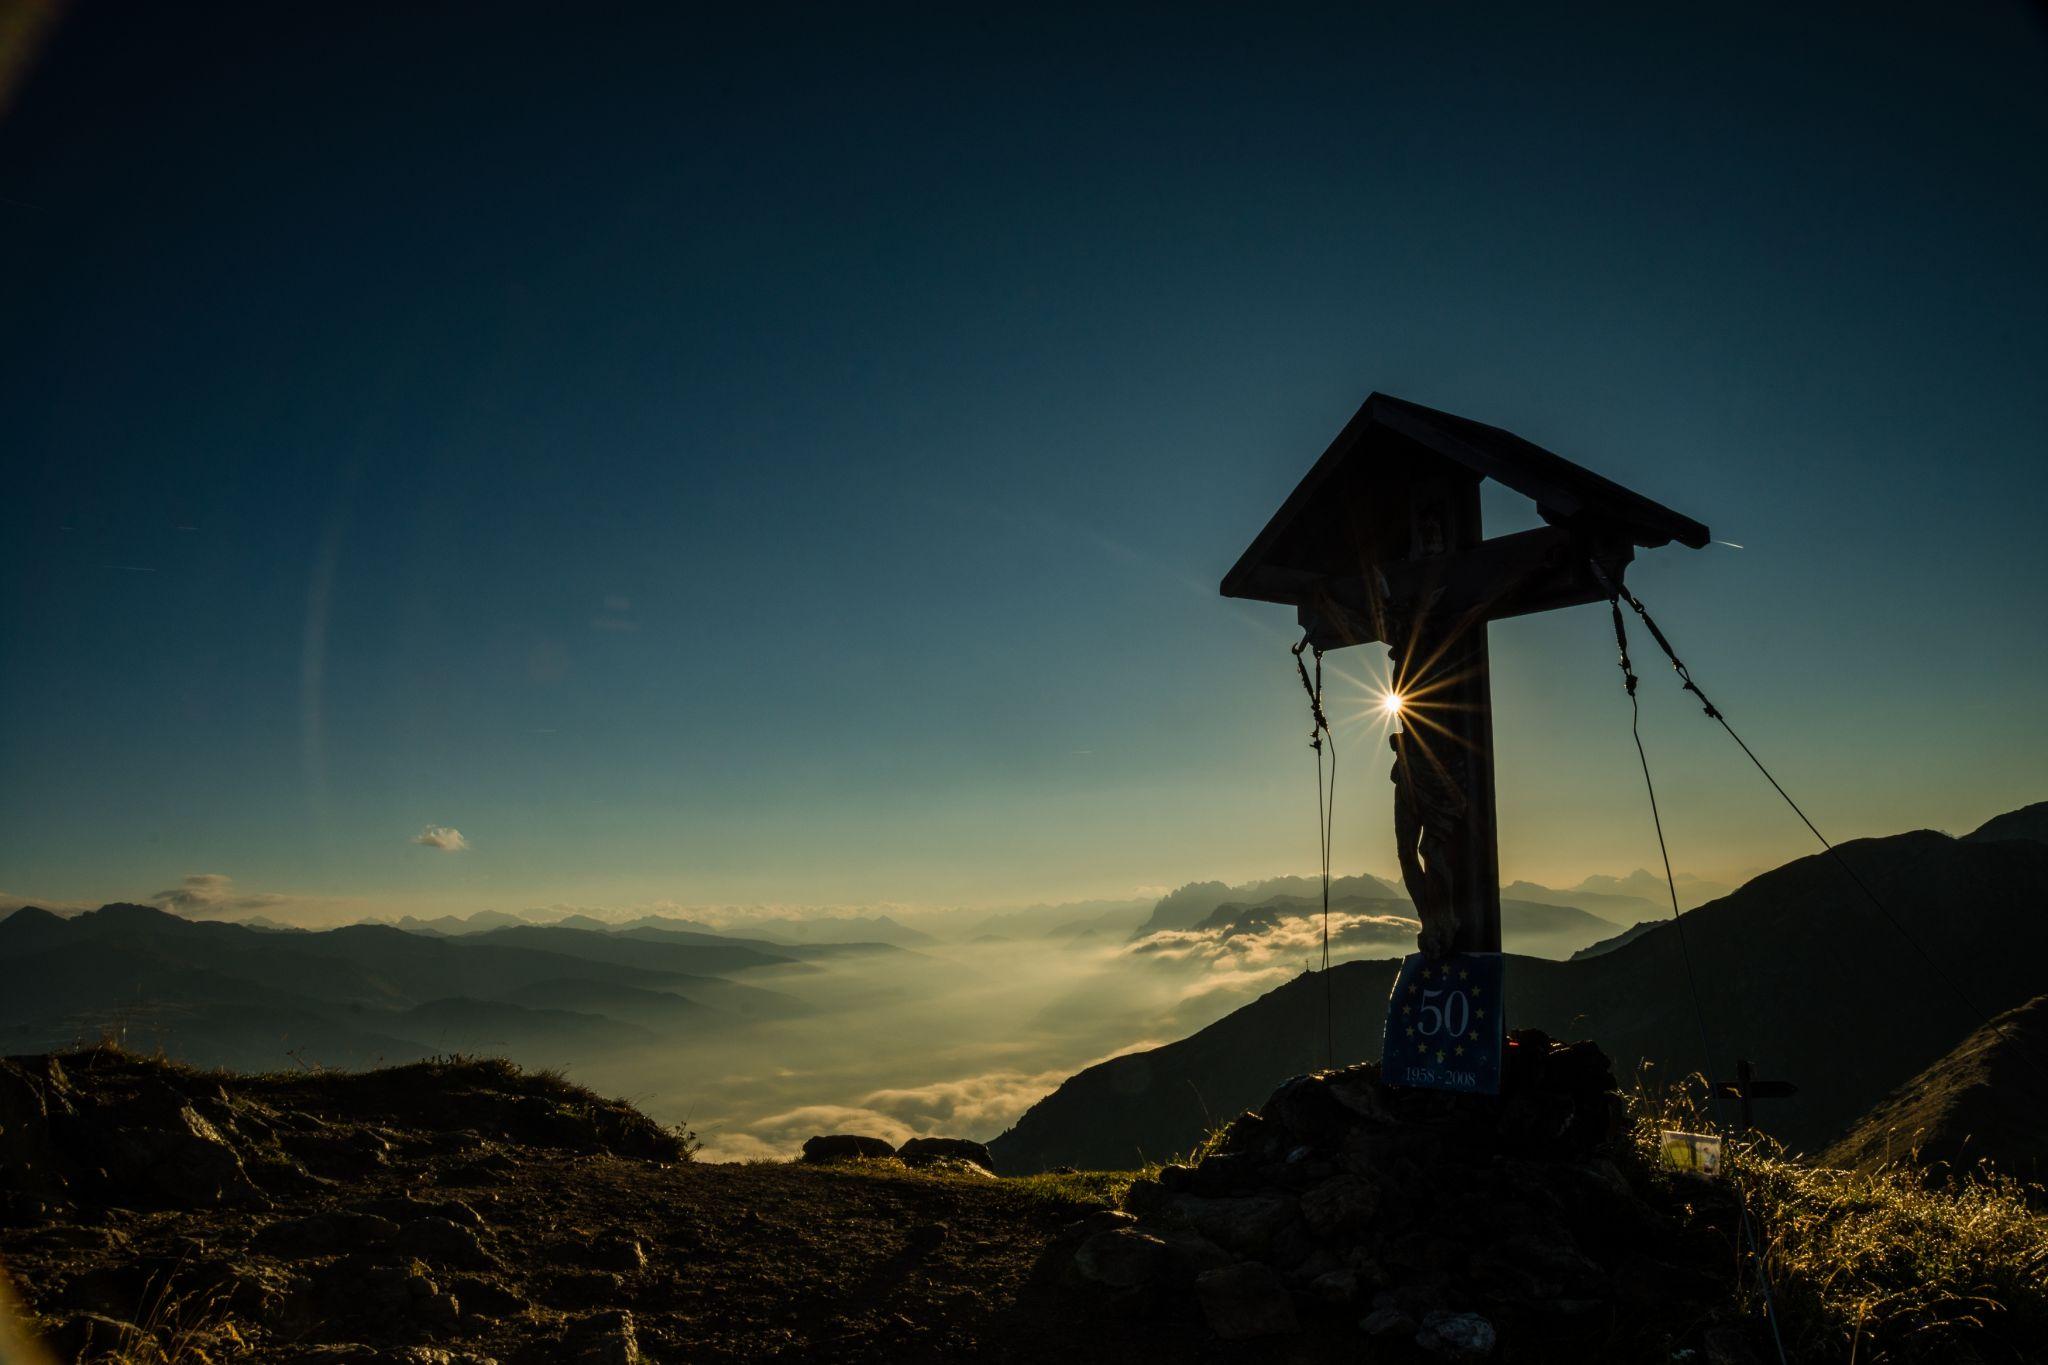 sunrise in the dolomiten italy, Austria